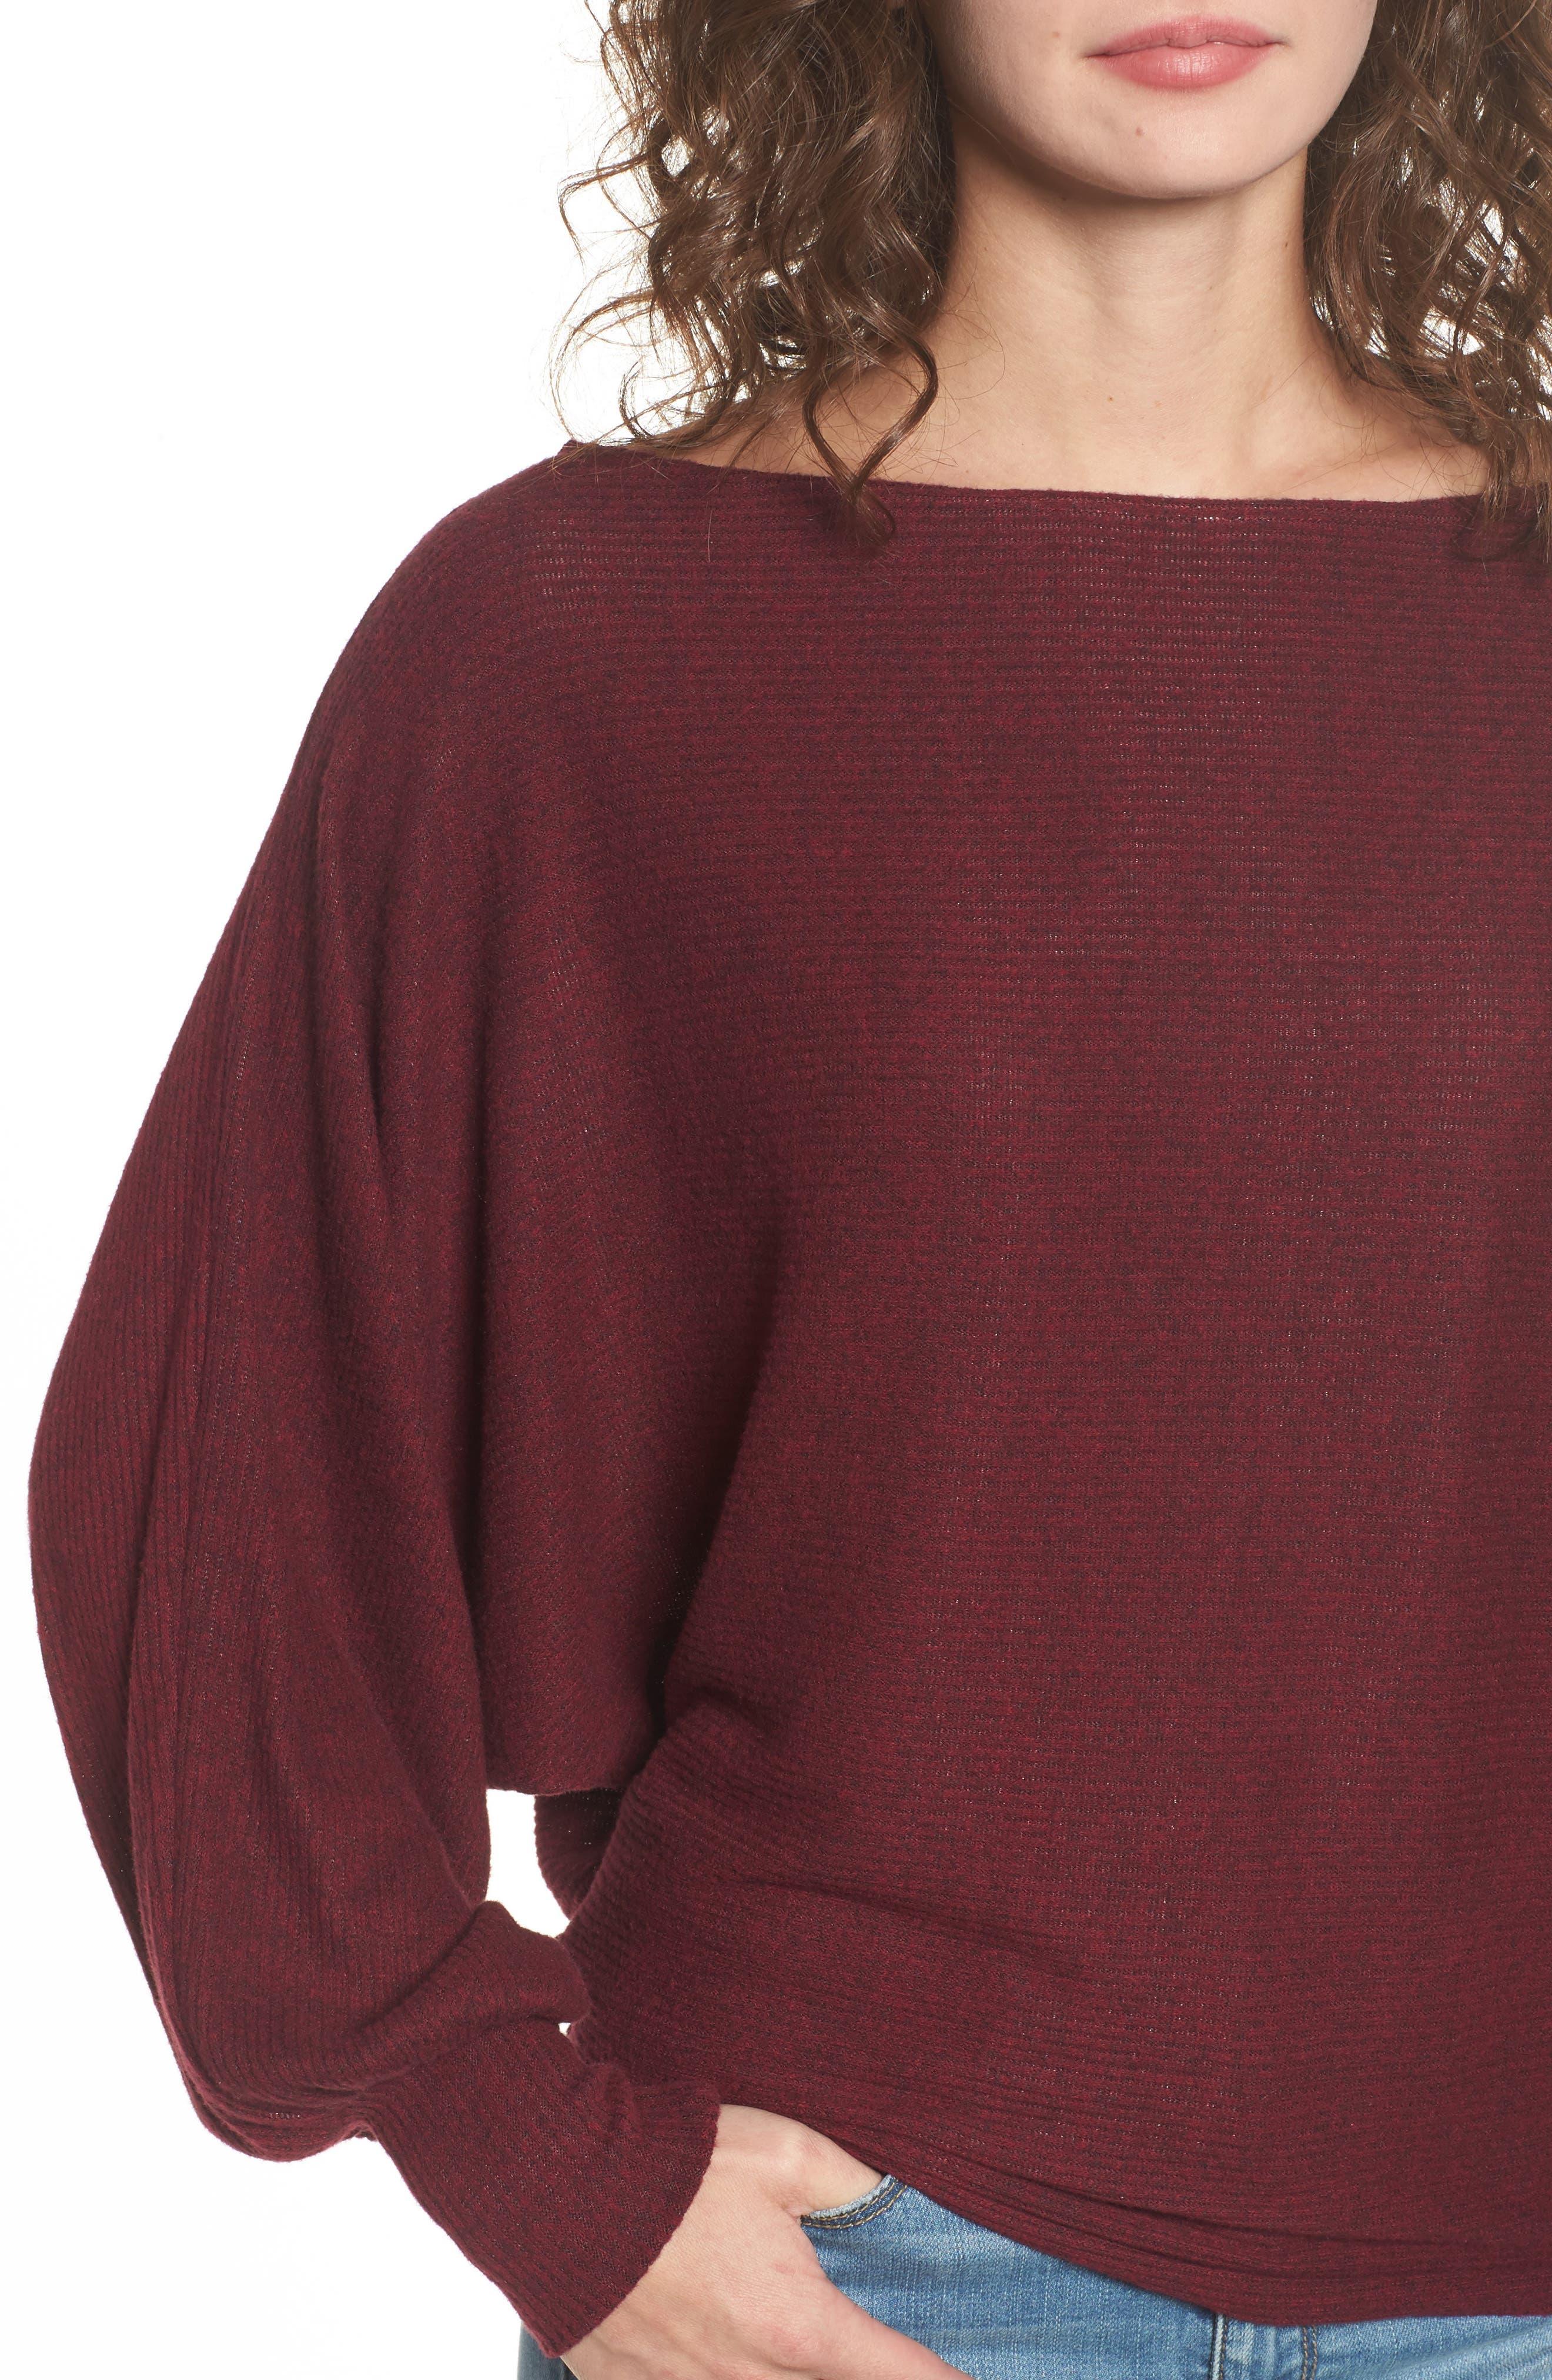 Balloon Sleeve Sweater,                             Alternate thumbnail 4, color,                             930